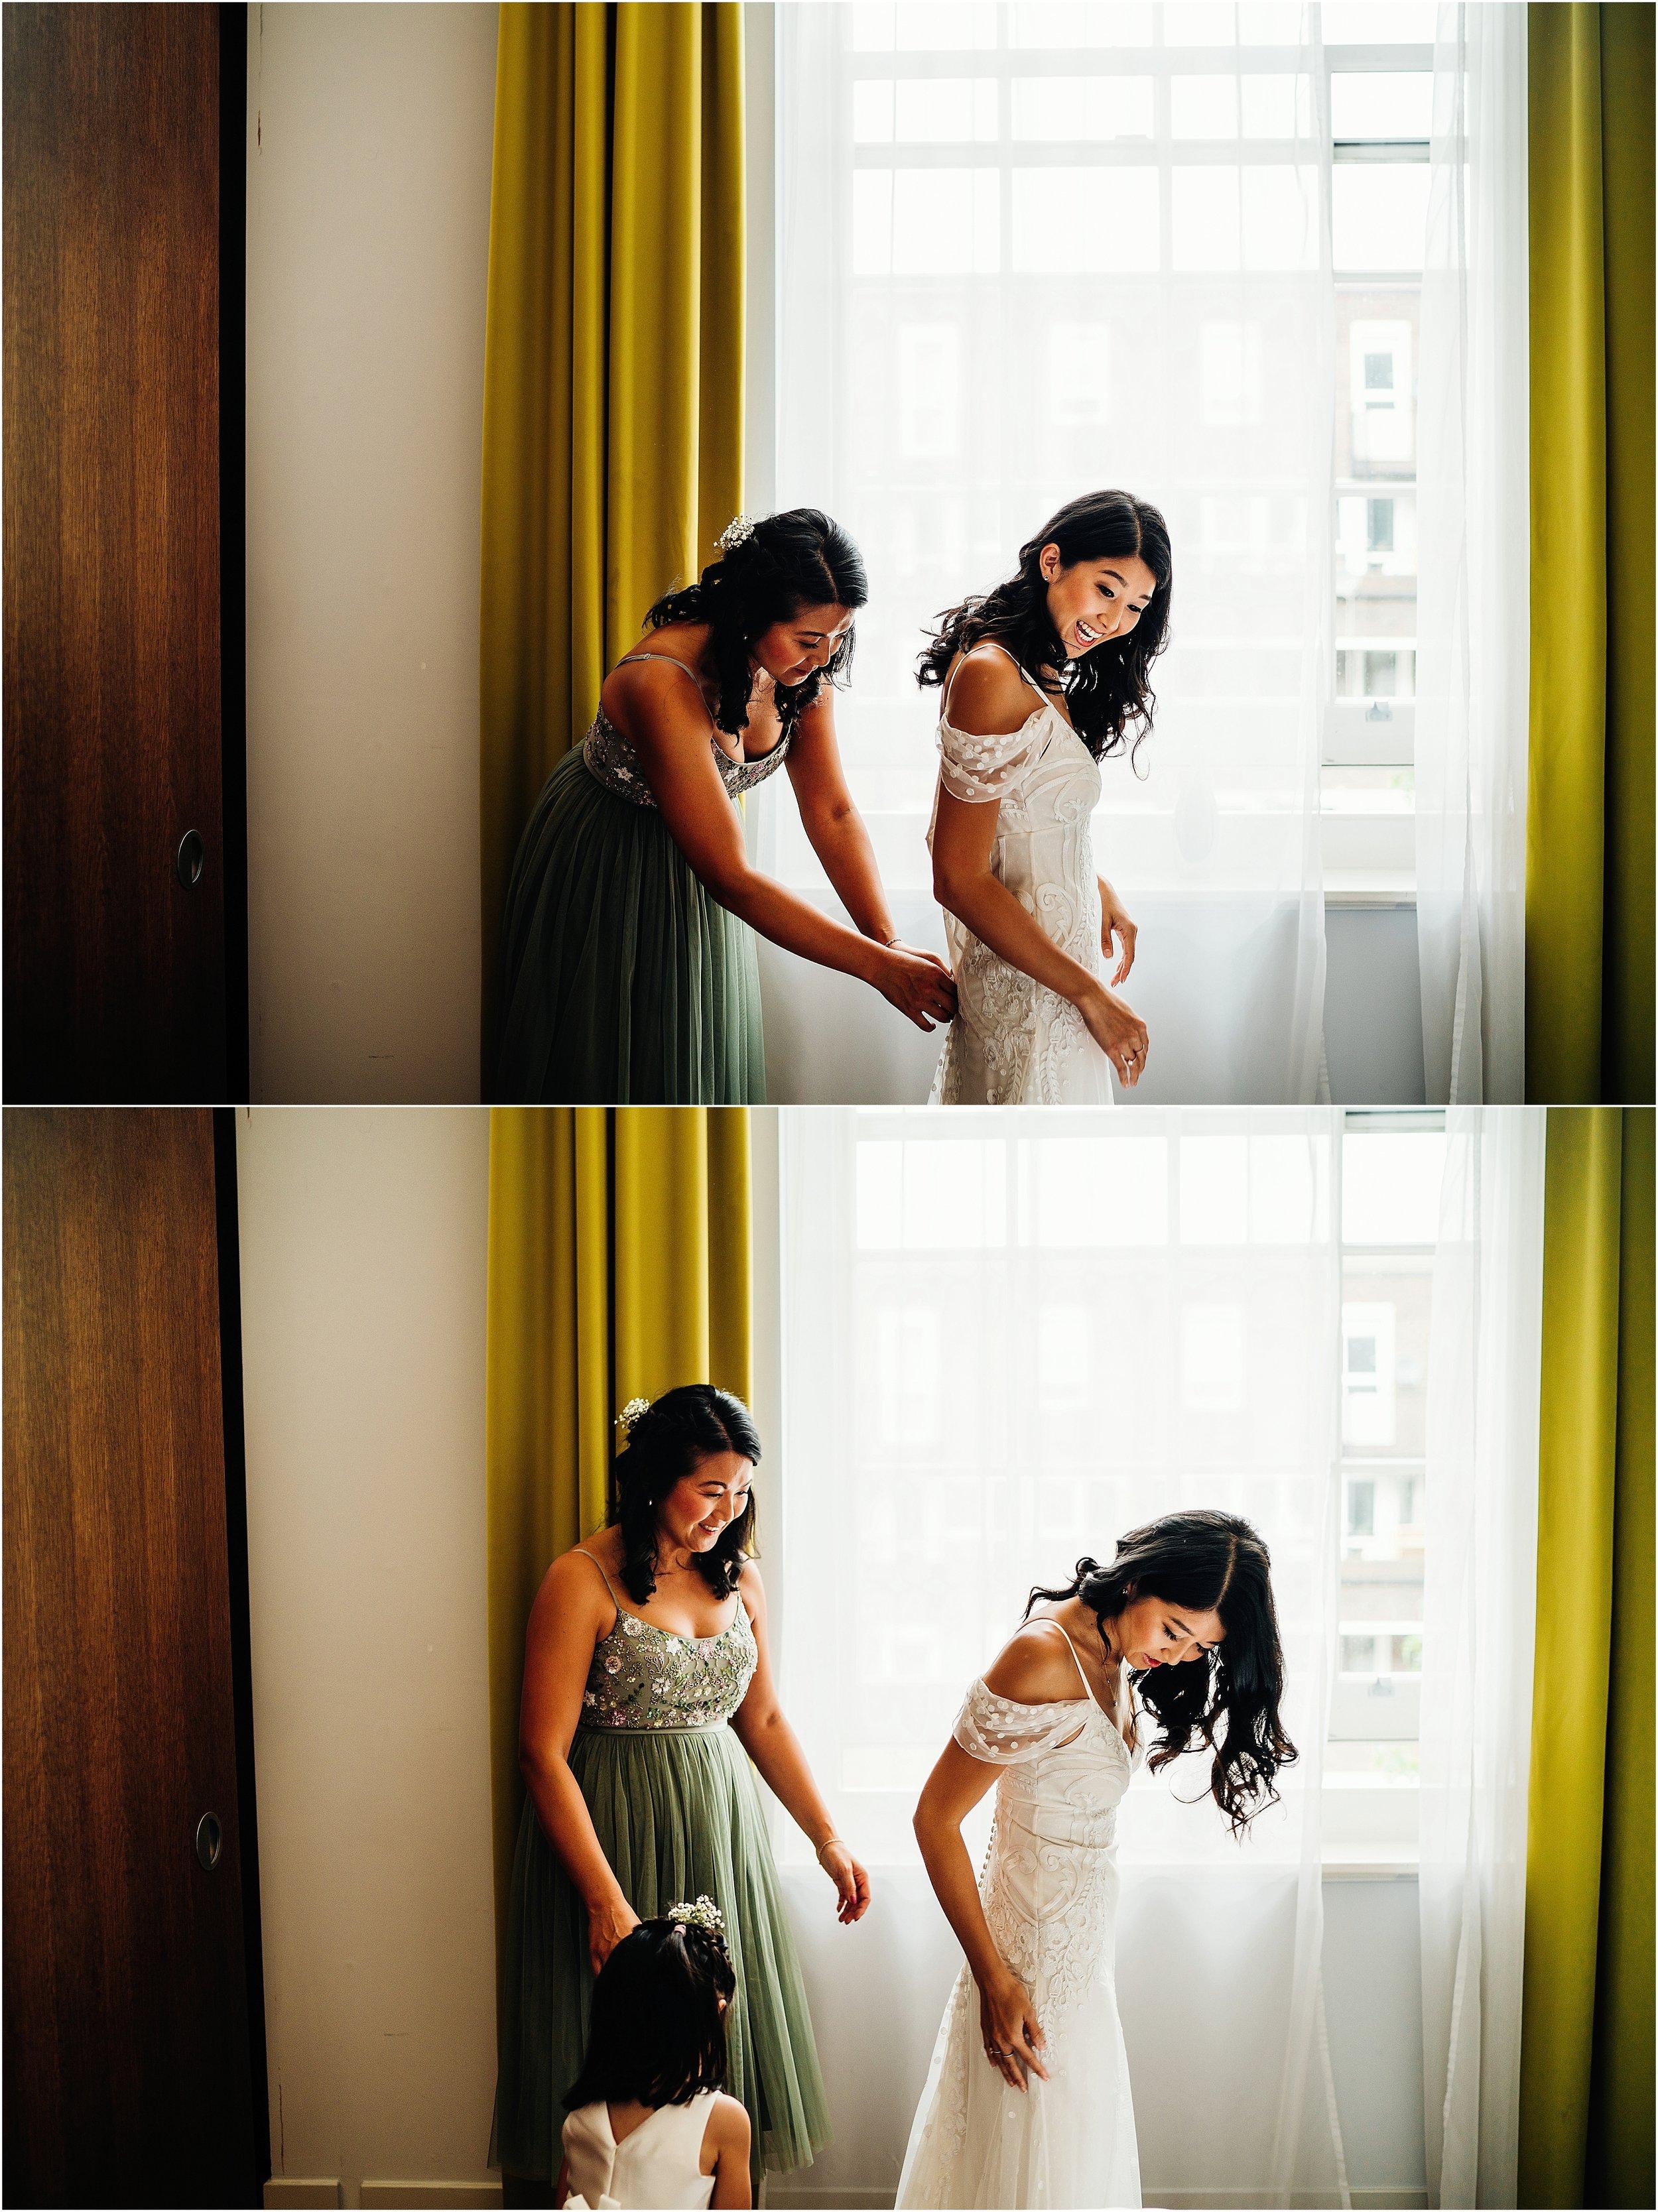 bethnal green town hall hotel wedding_0016.jpg